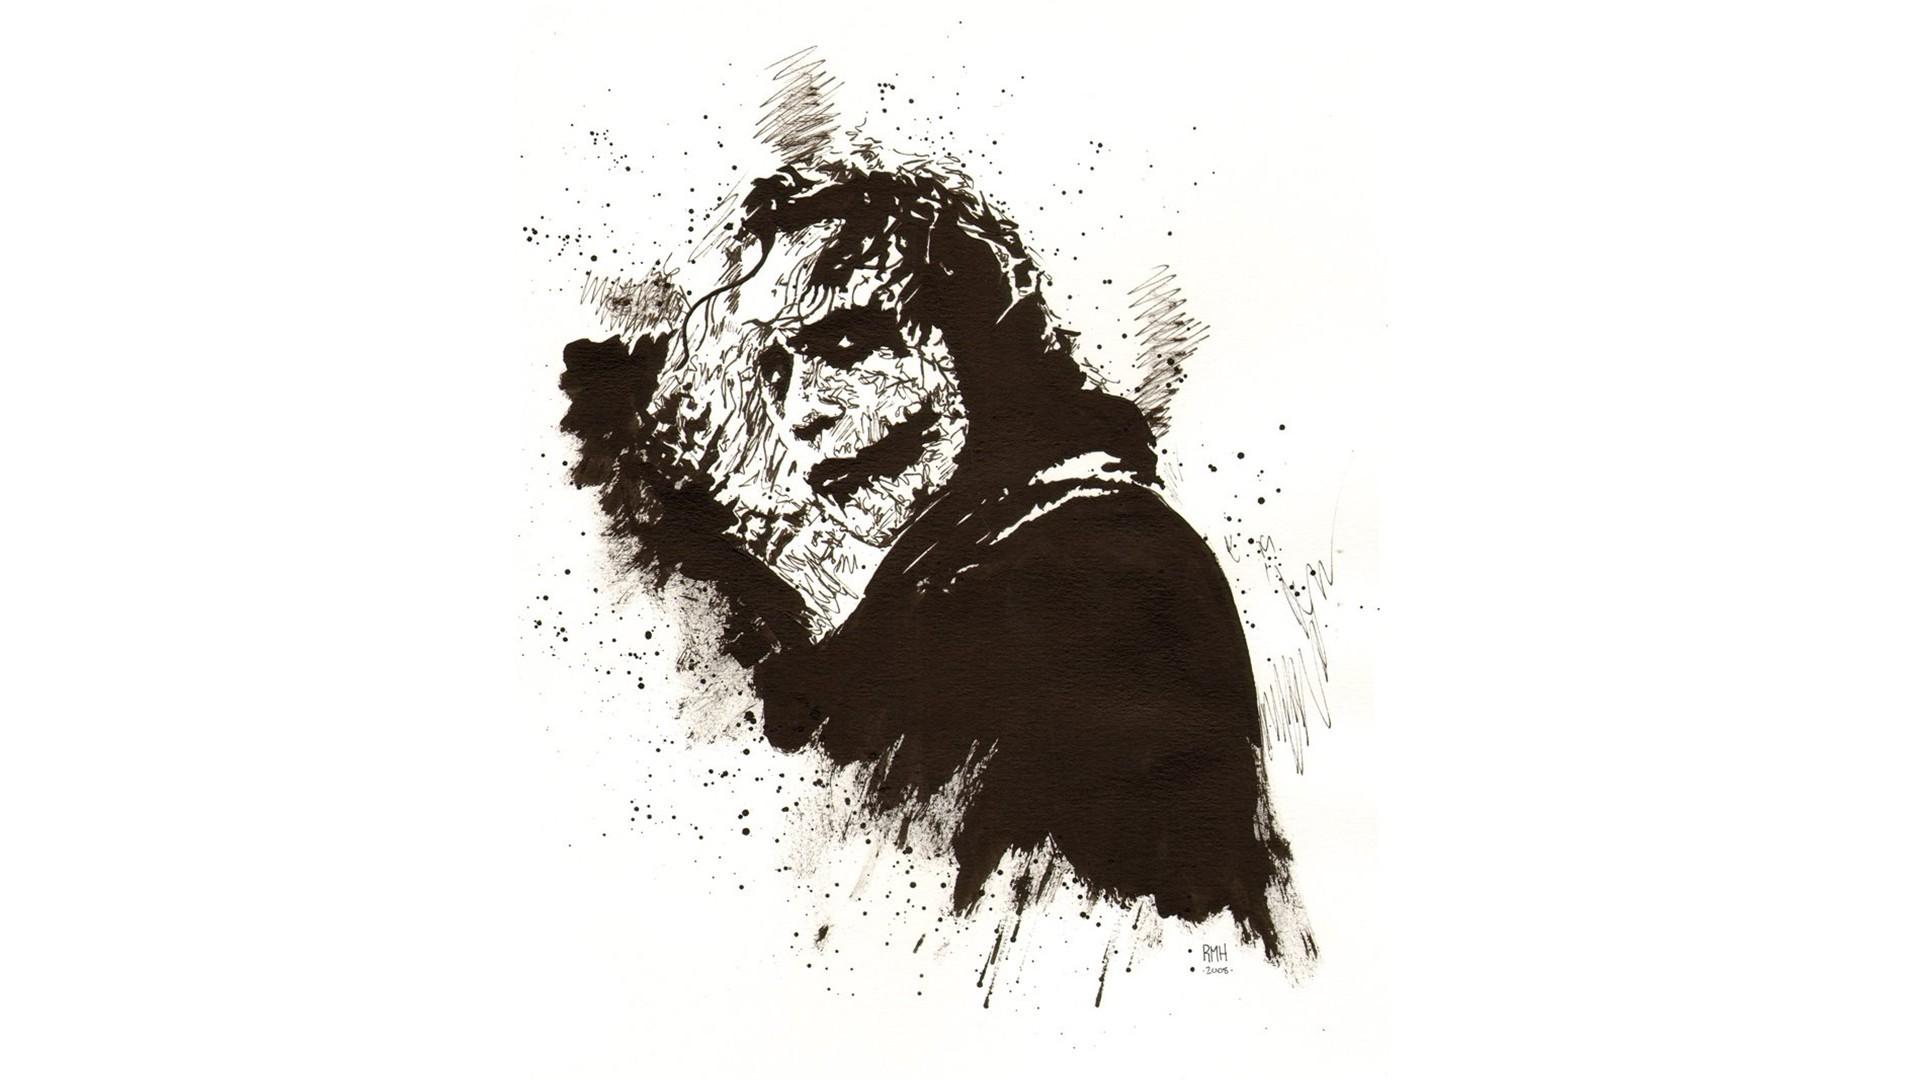 General 1920x1080 Joker Batman Heath Ledger The Dark Knight white background